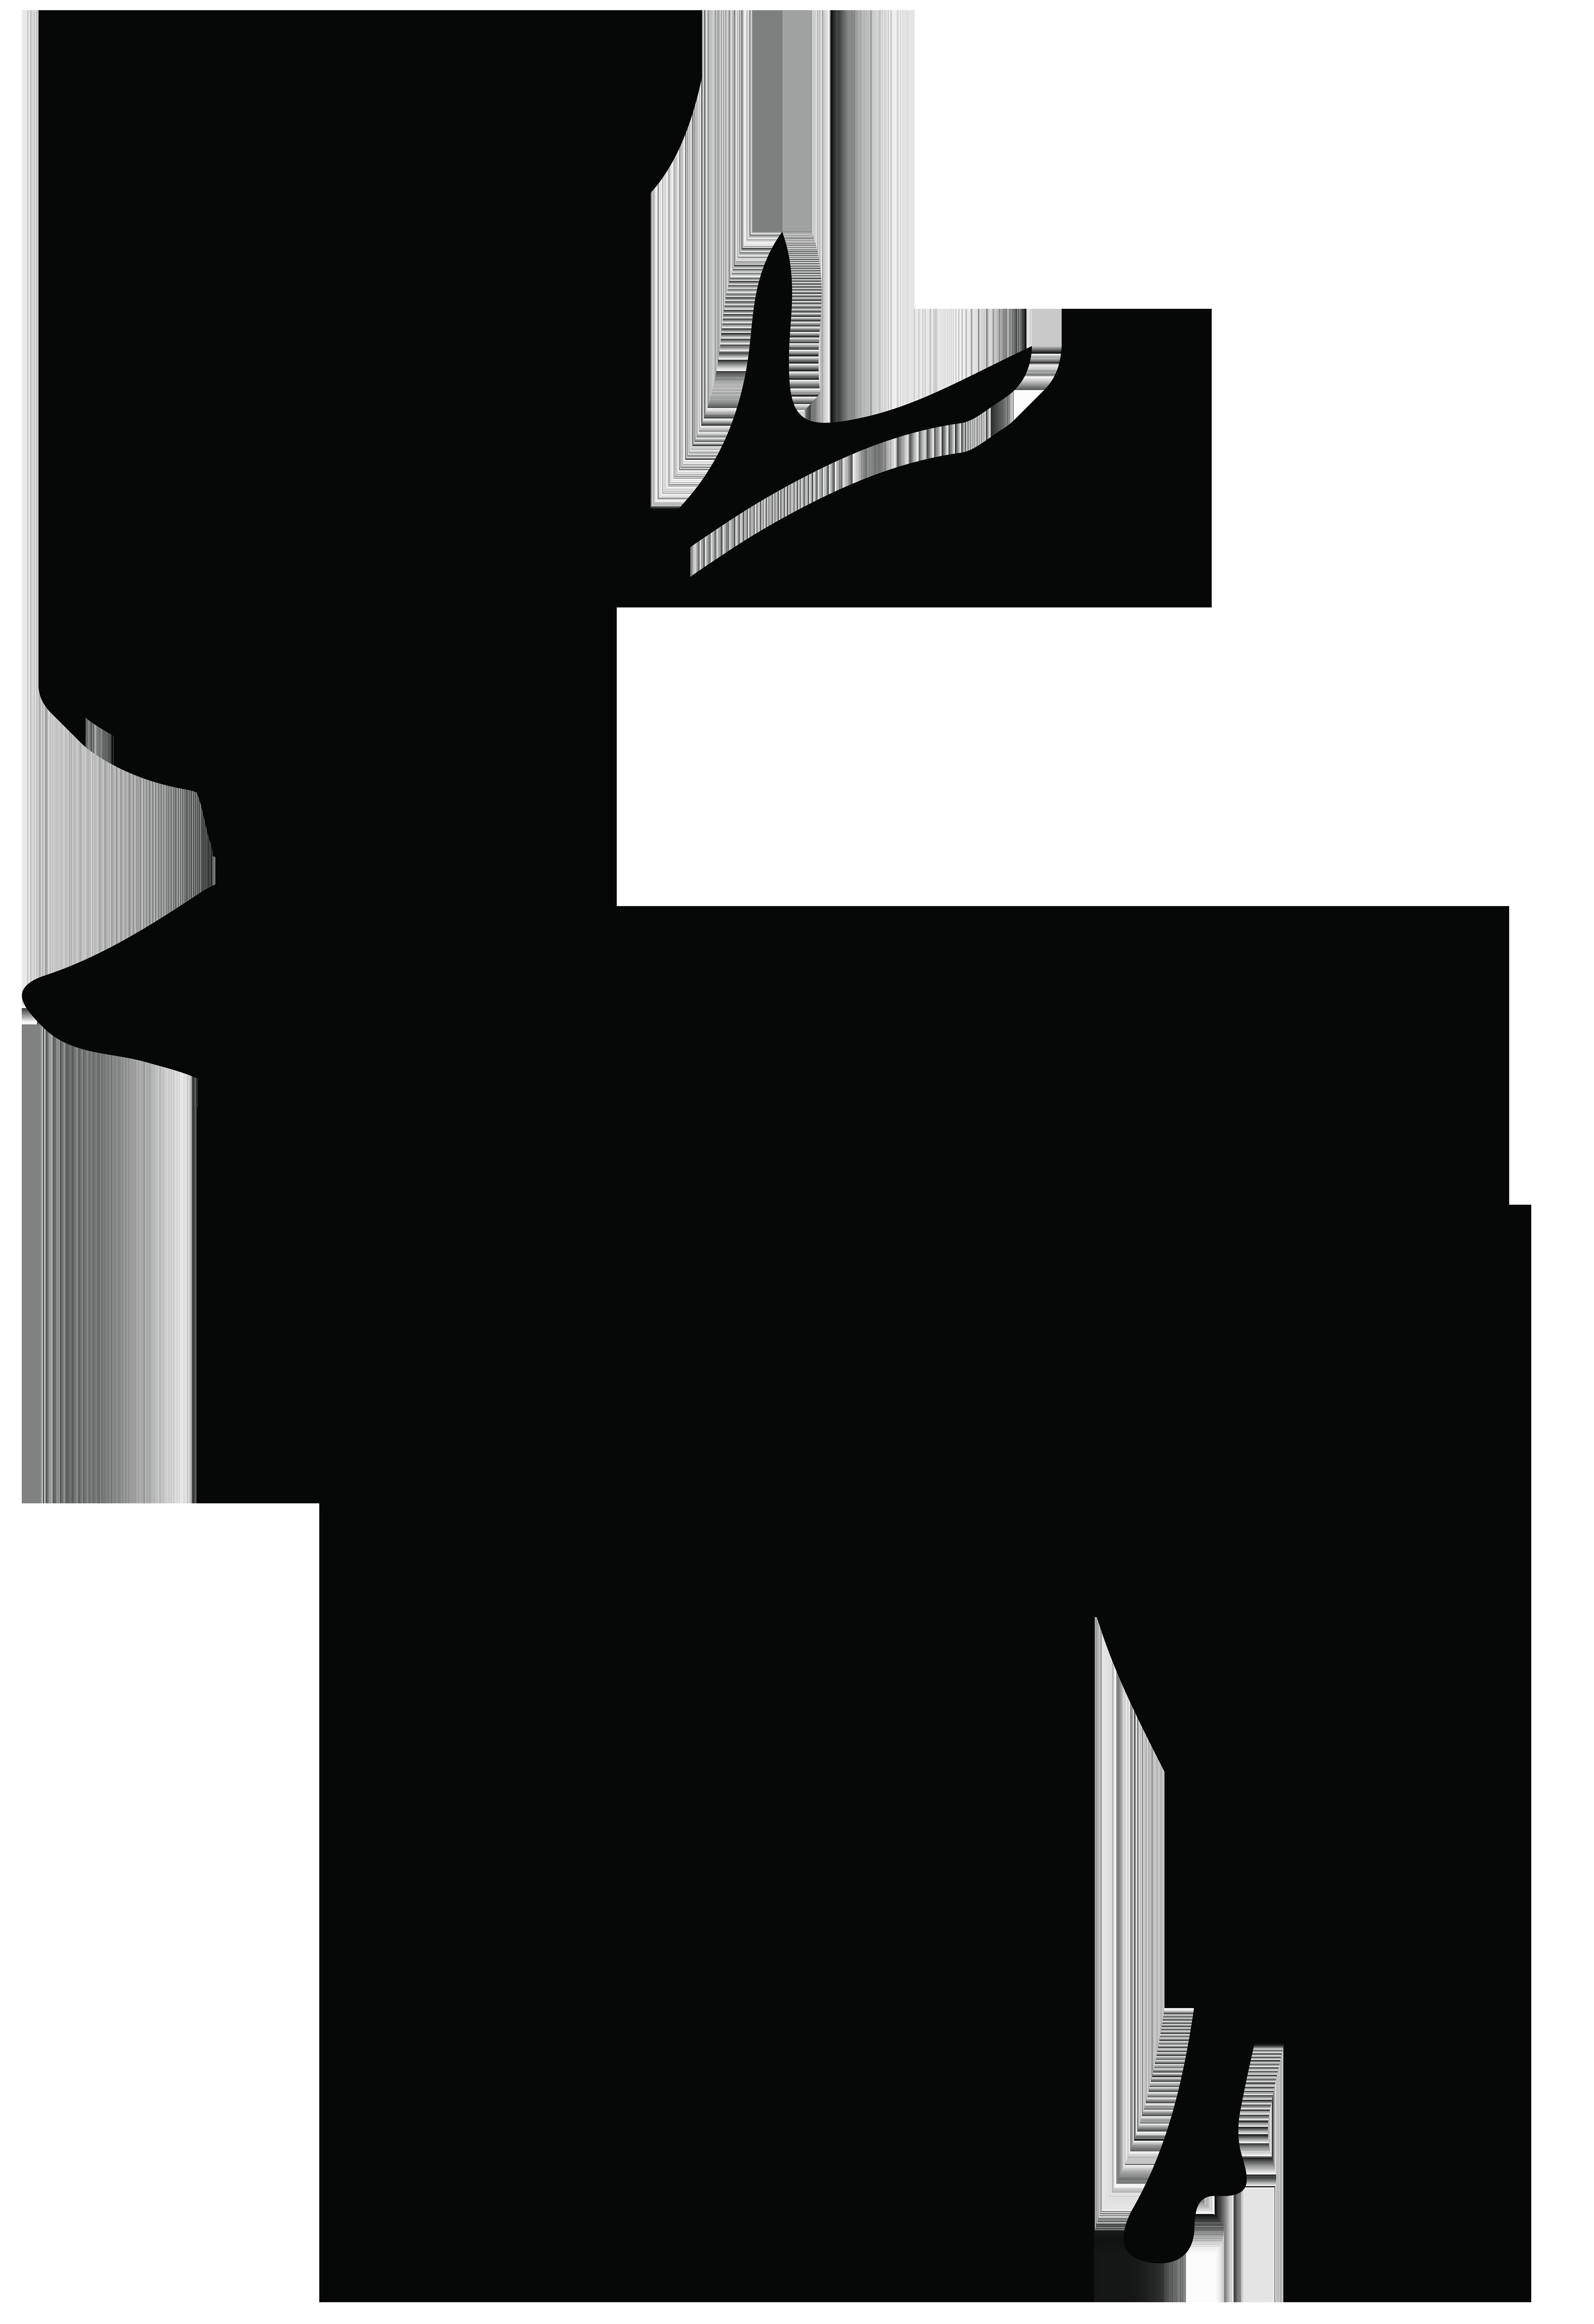 5487x8000 Buck Clipart Silhouette